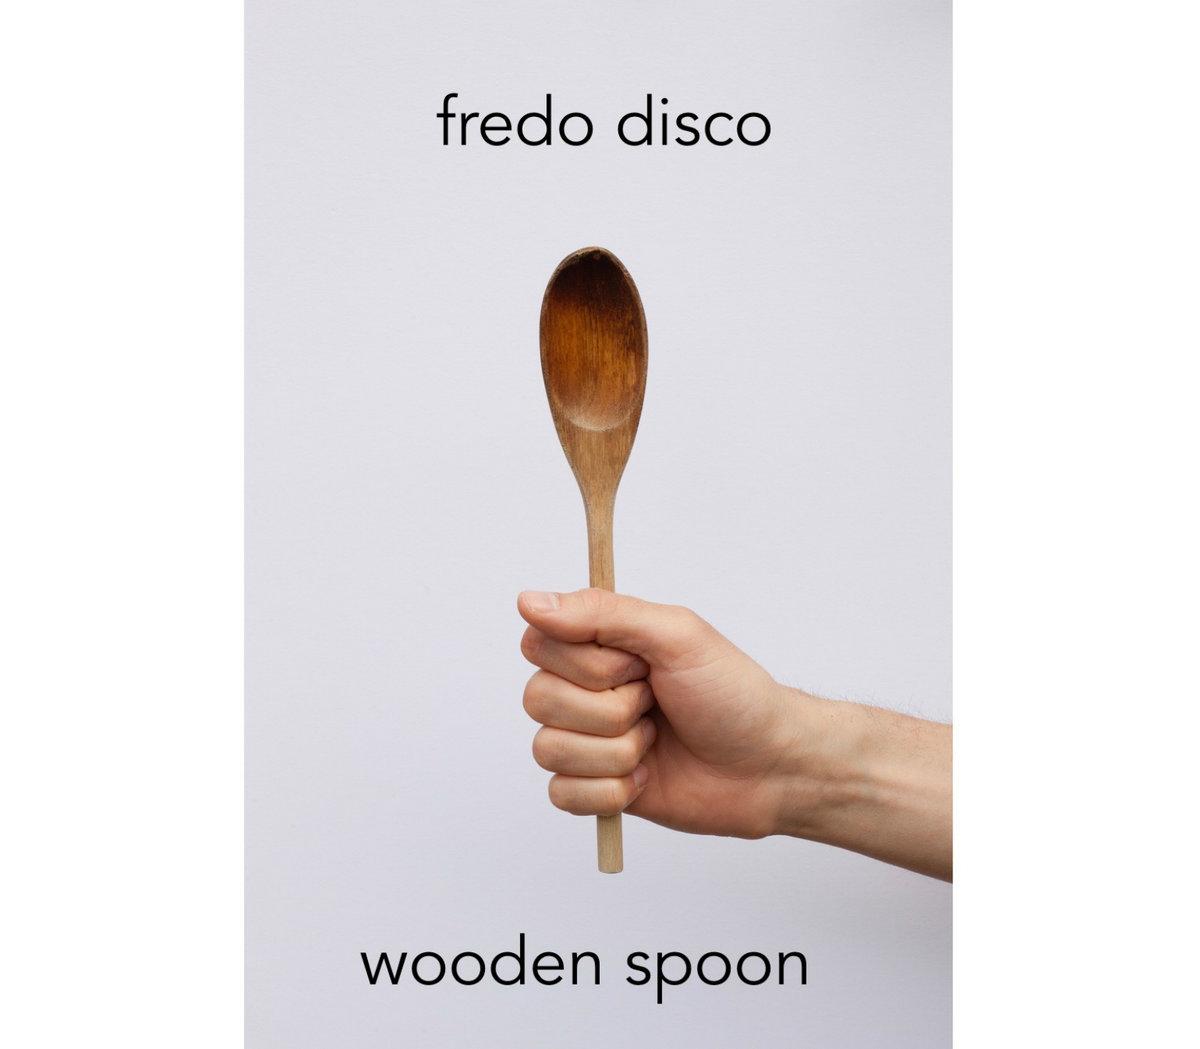 Wooden Spoon Fredo Disco